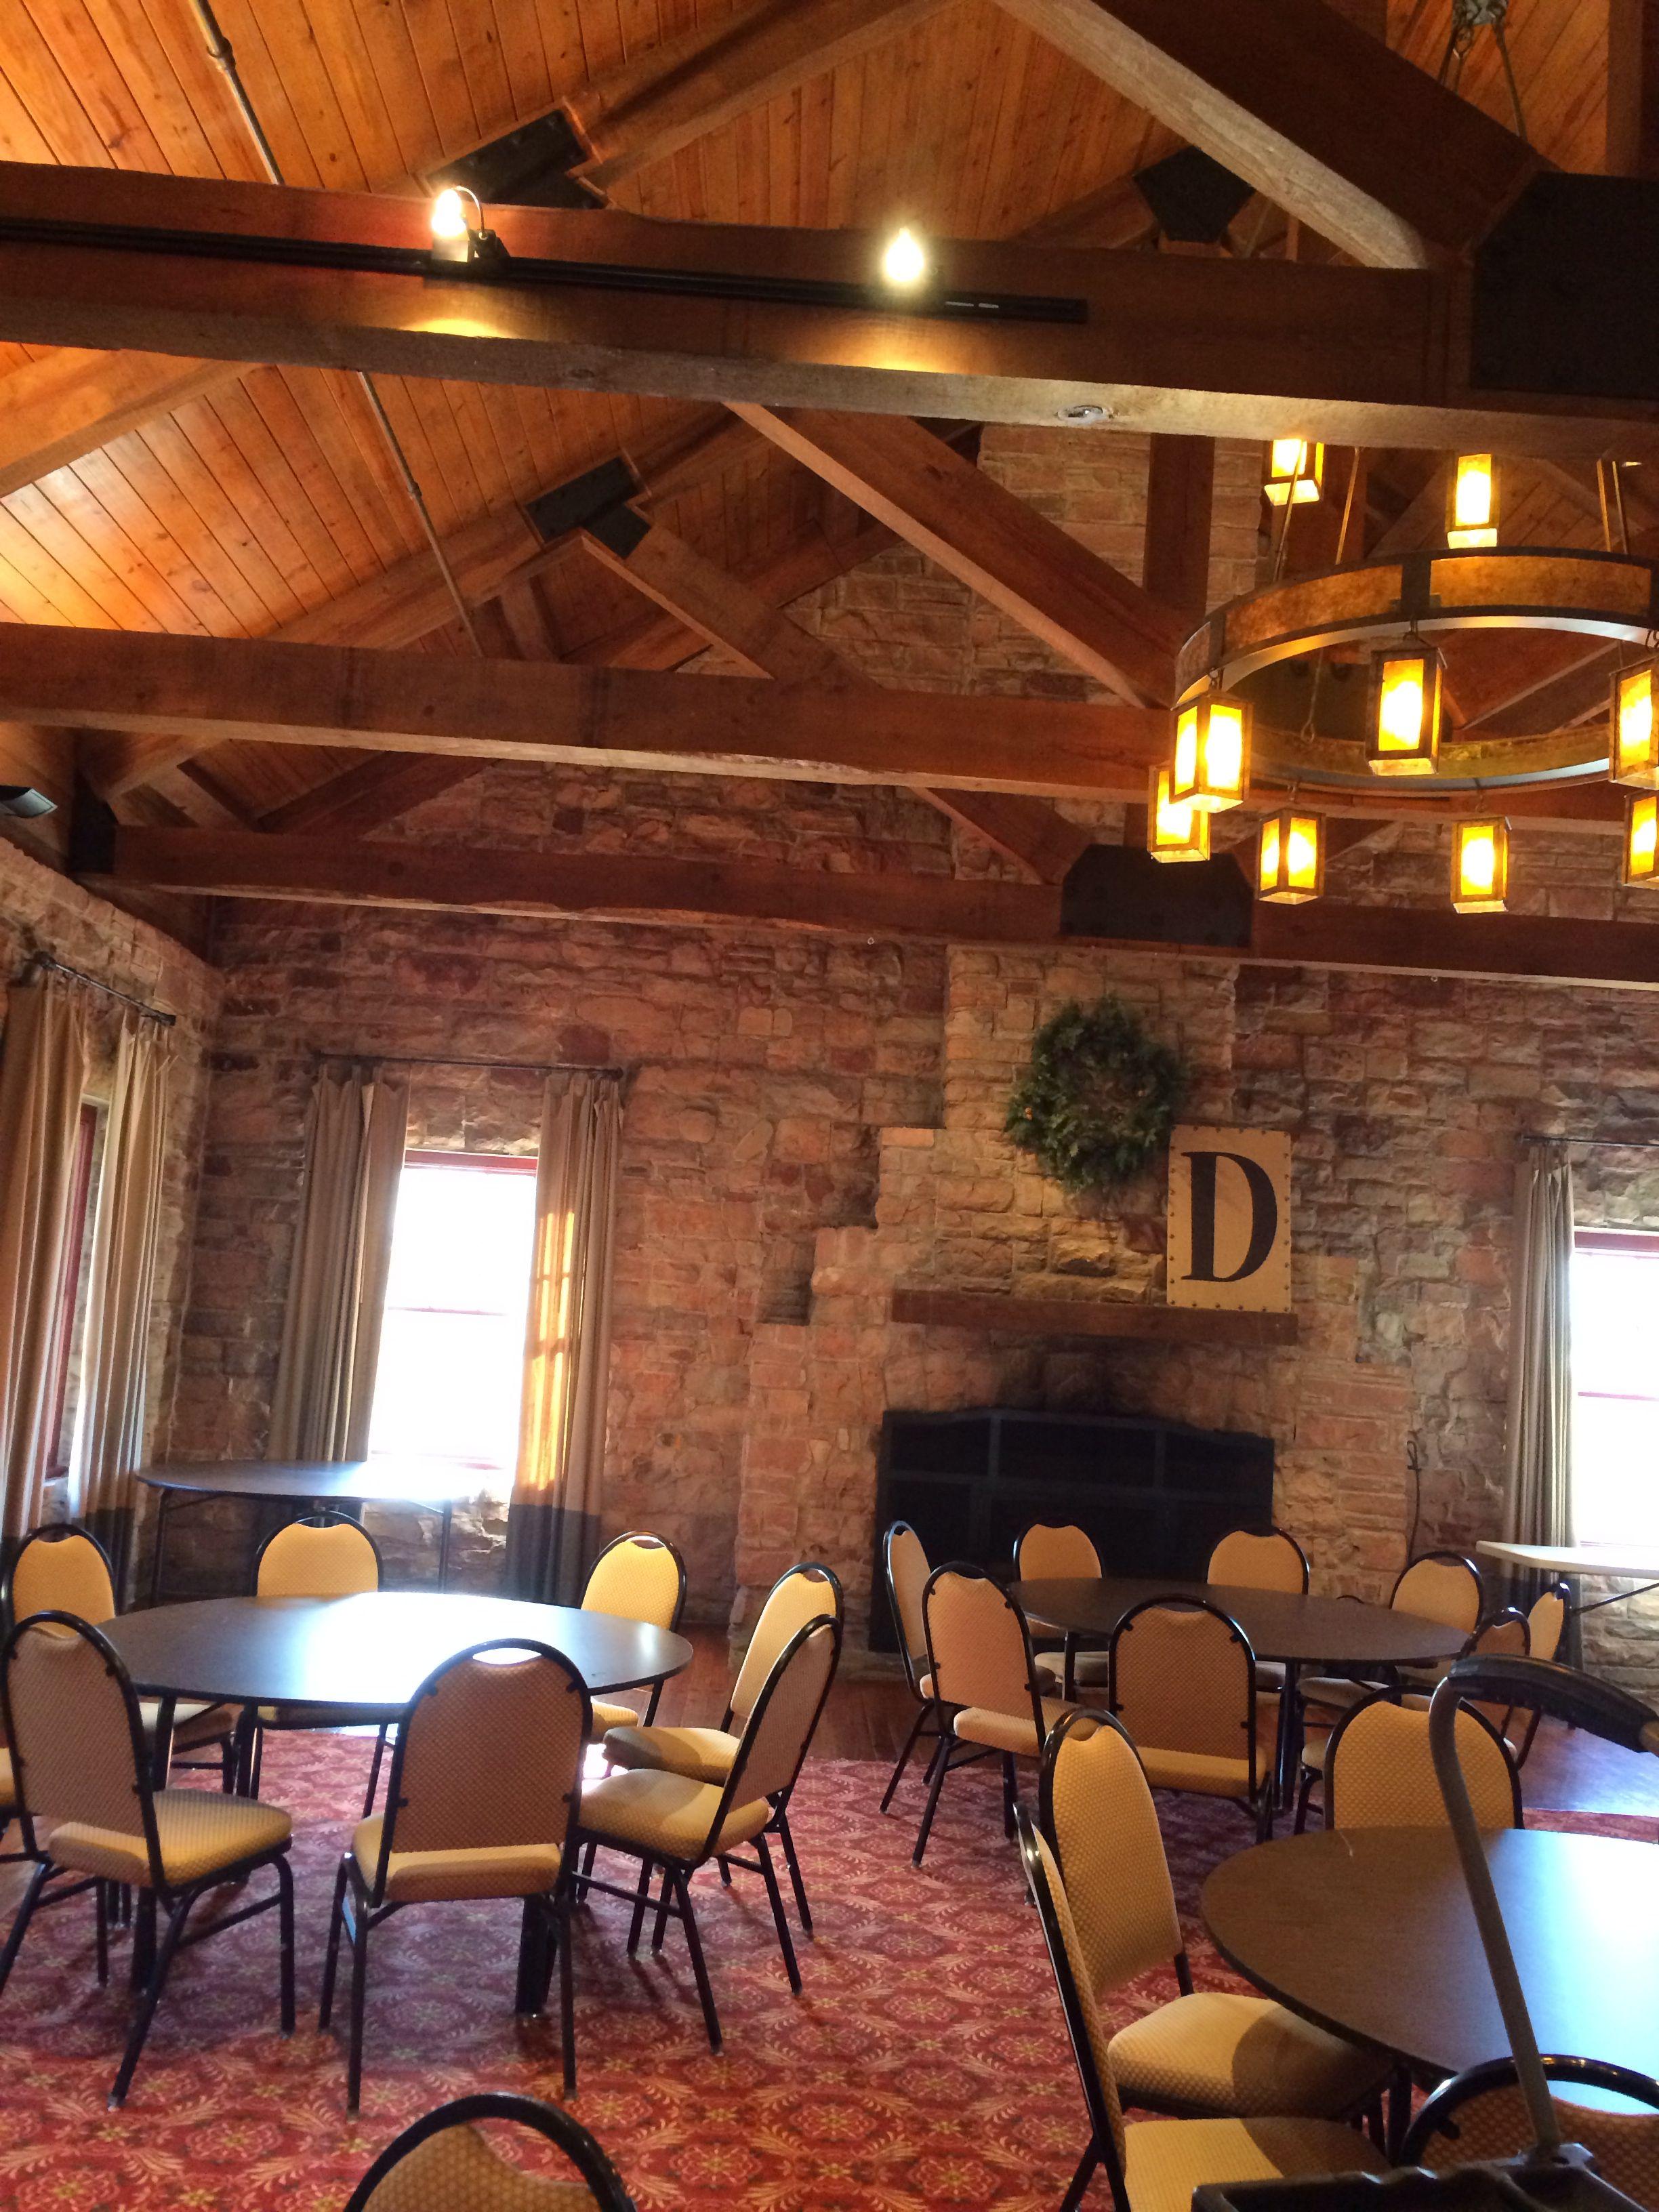 Monte Sano Lodge Huntsville Al Sweet Home Lodges